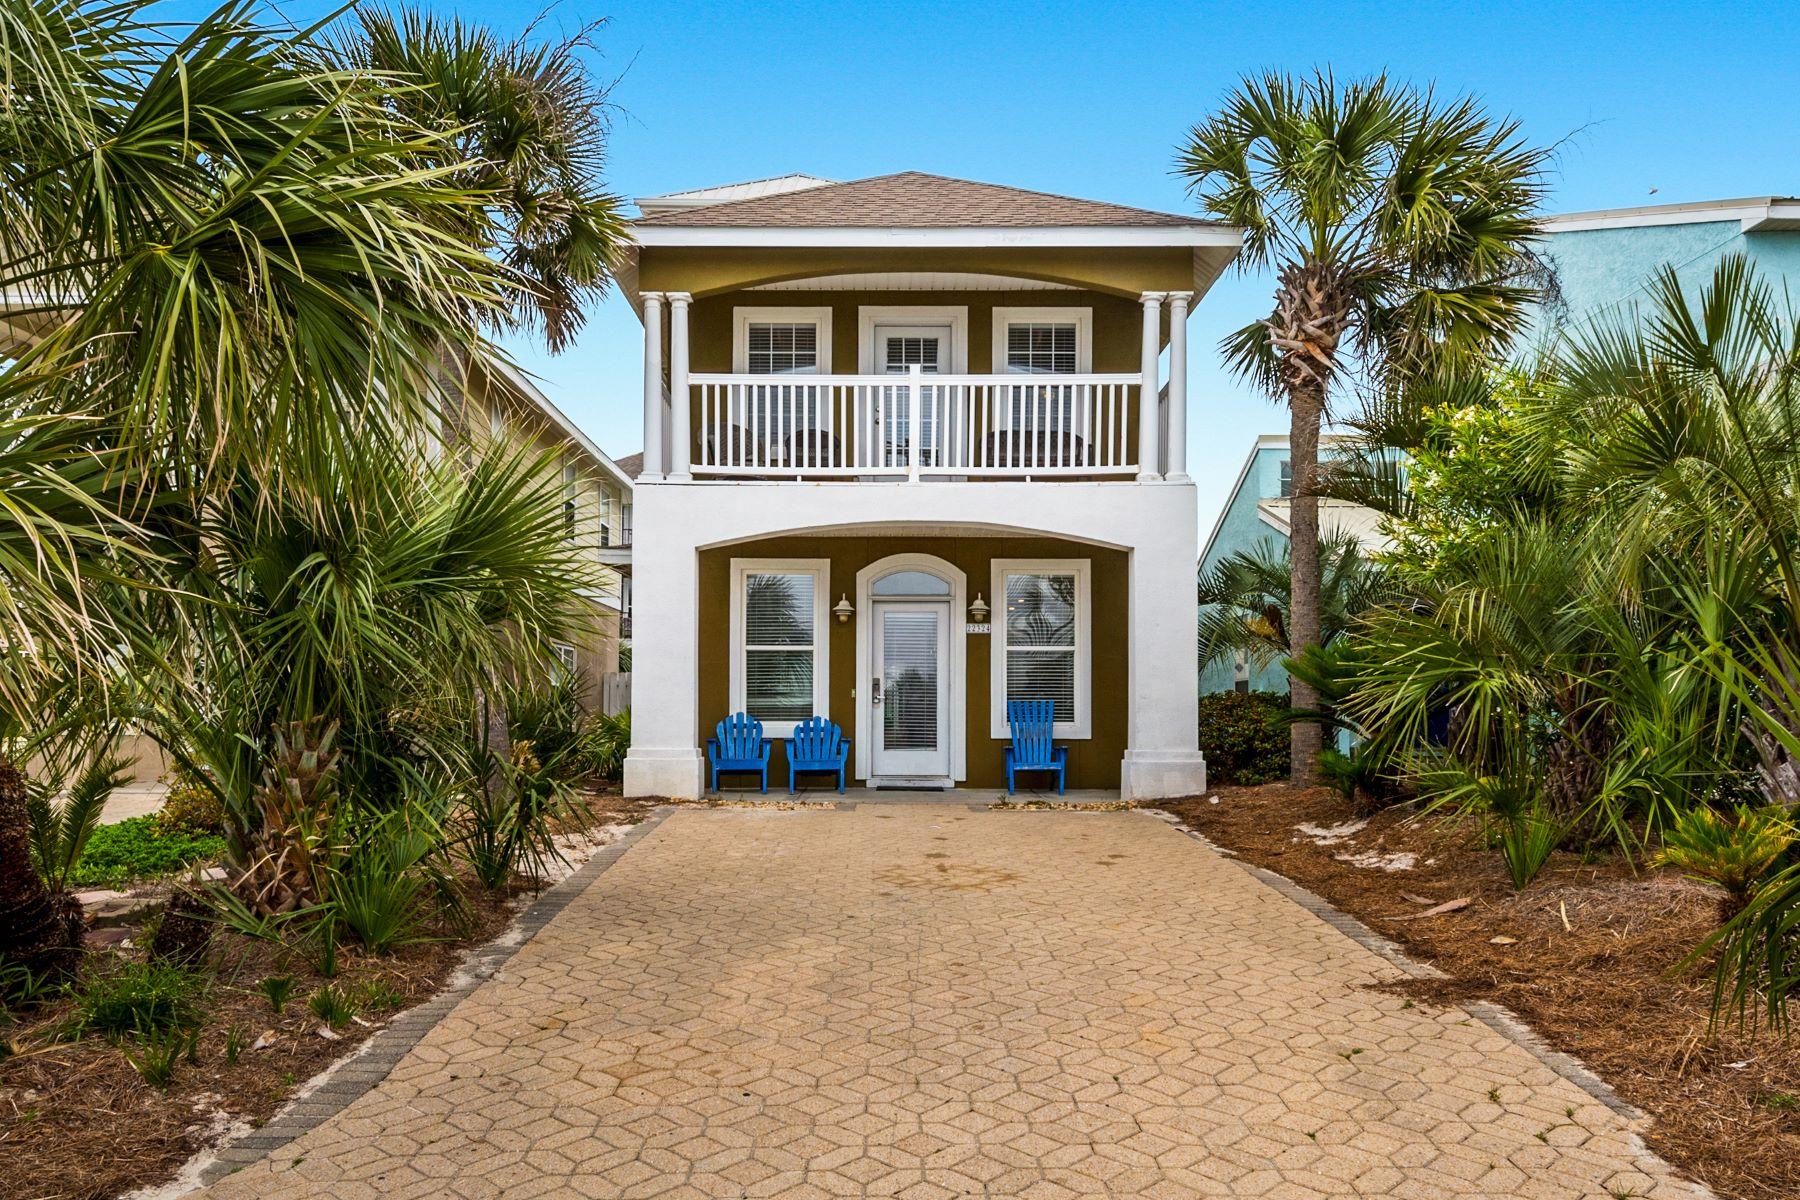 Single Family Homes für Verkauf beim Multiple Level Home with Unobstructed Gulf Views Near 30A 22324 Front Beach Road, Panama City Beach, Florida 32413 Vereinigte Staaten